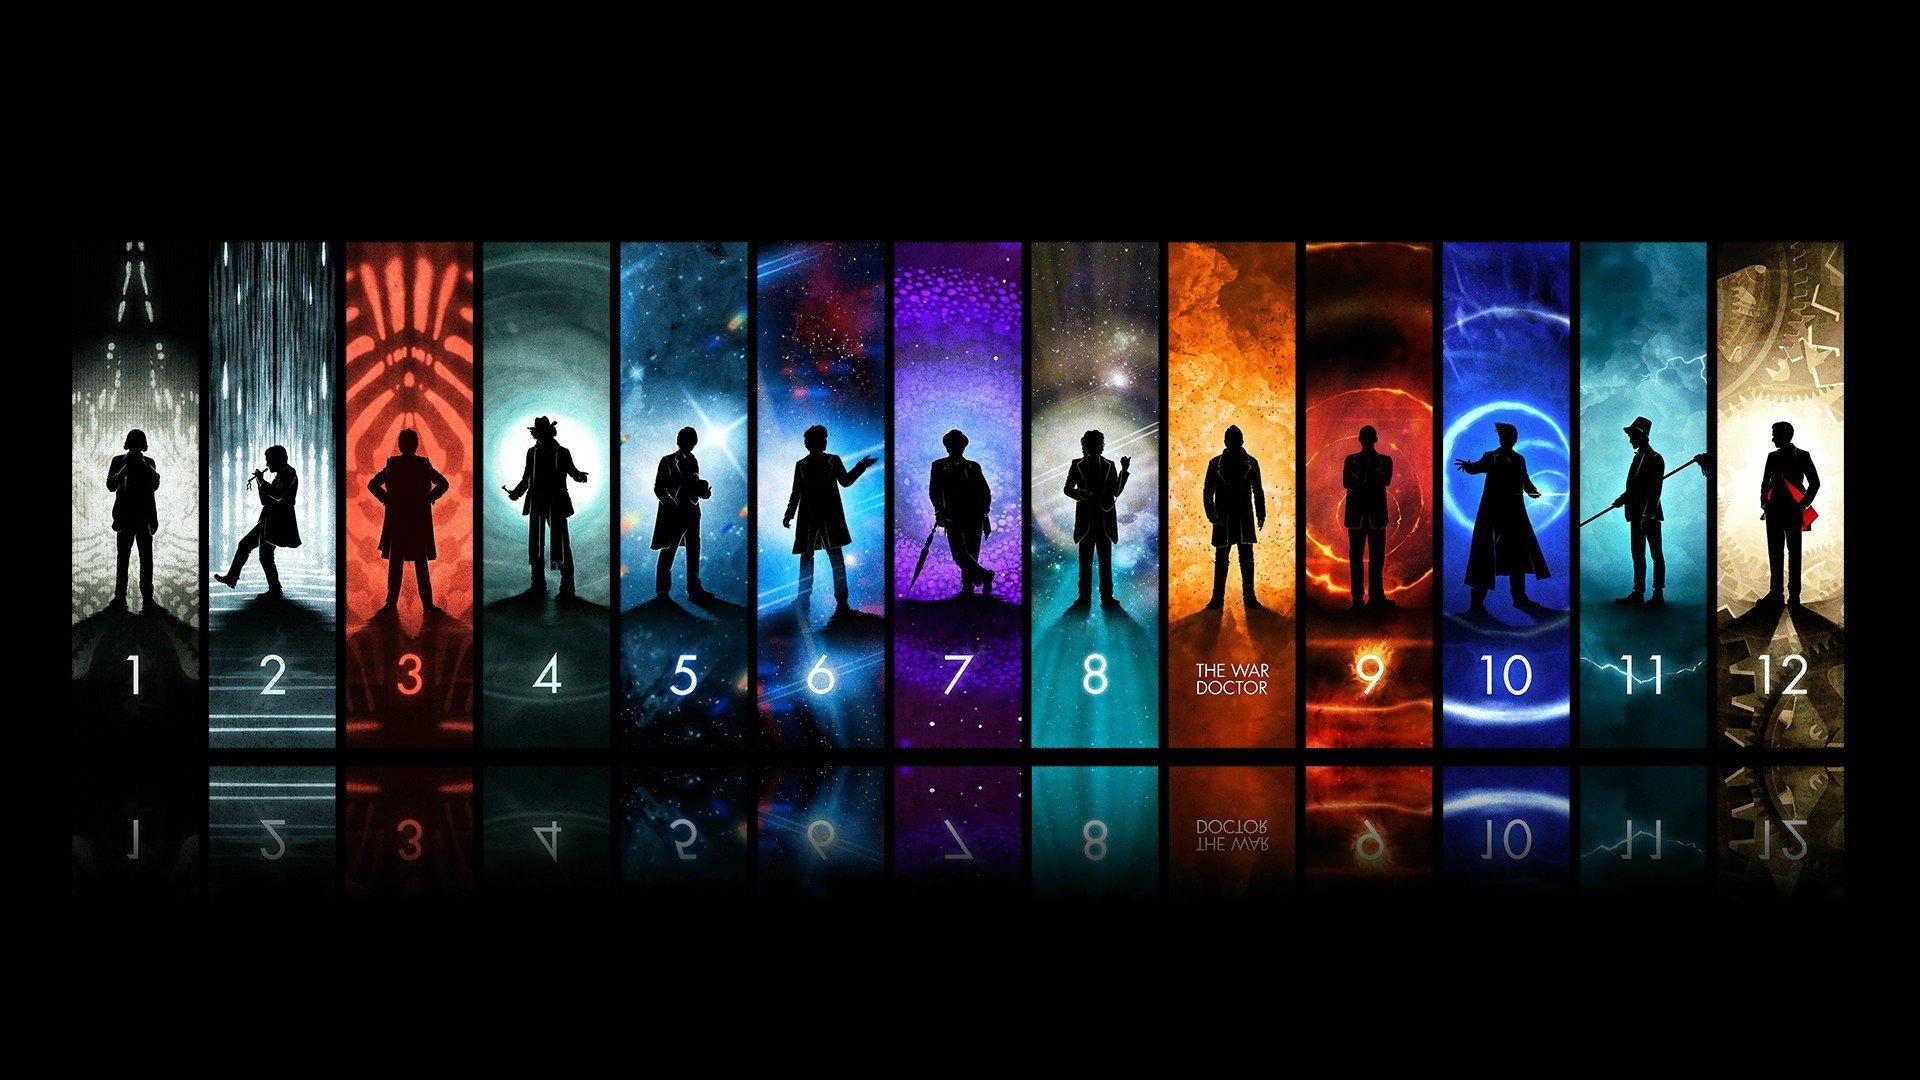 Doctor Who Wallpapers 1920x1080 Full Hd 1080p Desktop